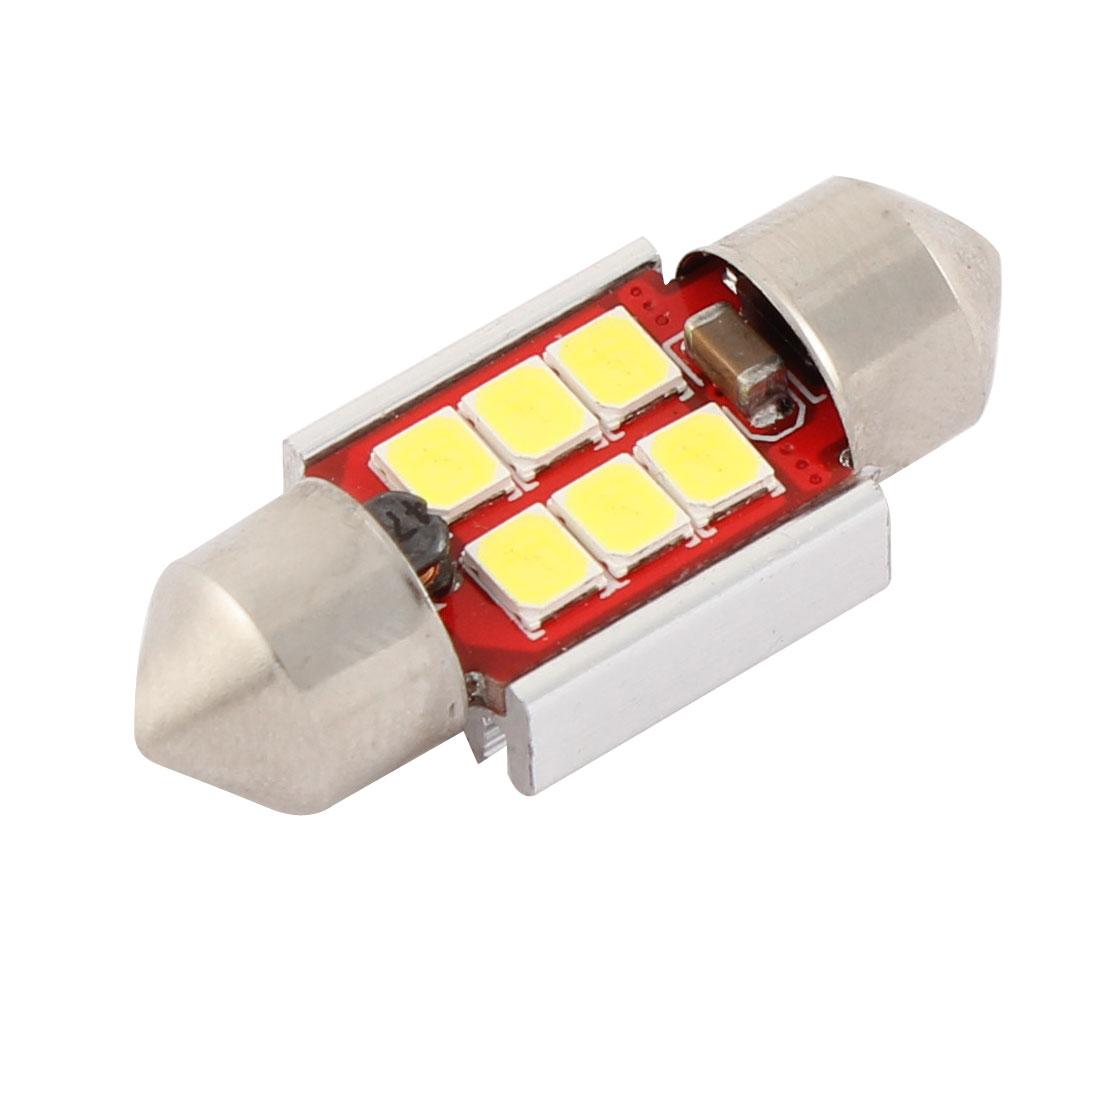 White 3528 6 SMD LED Auto Internal Map Light Dome Bulb 31mm Festoon Bulbs DC 12V Interior